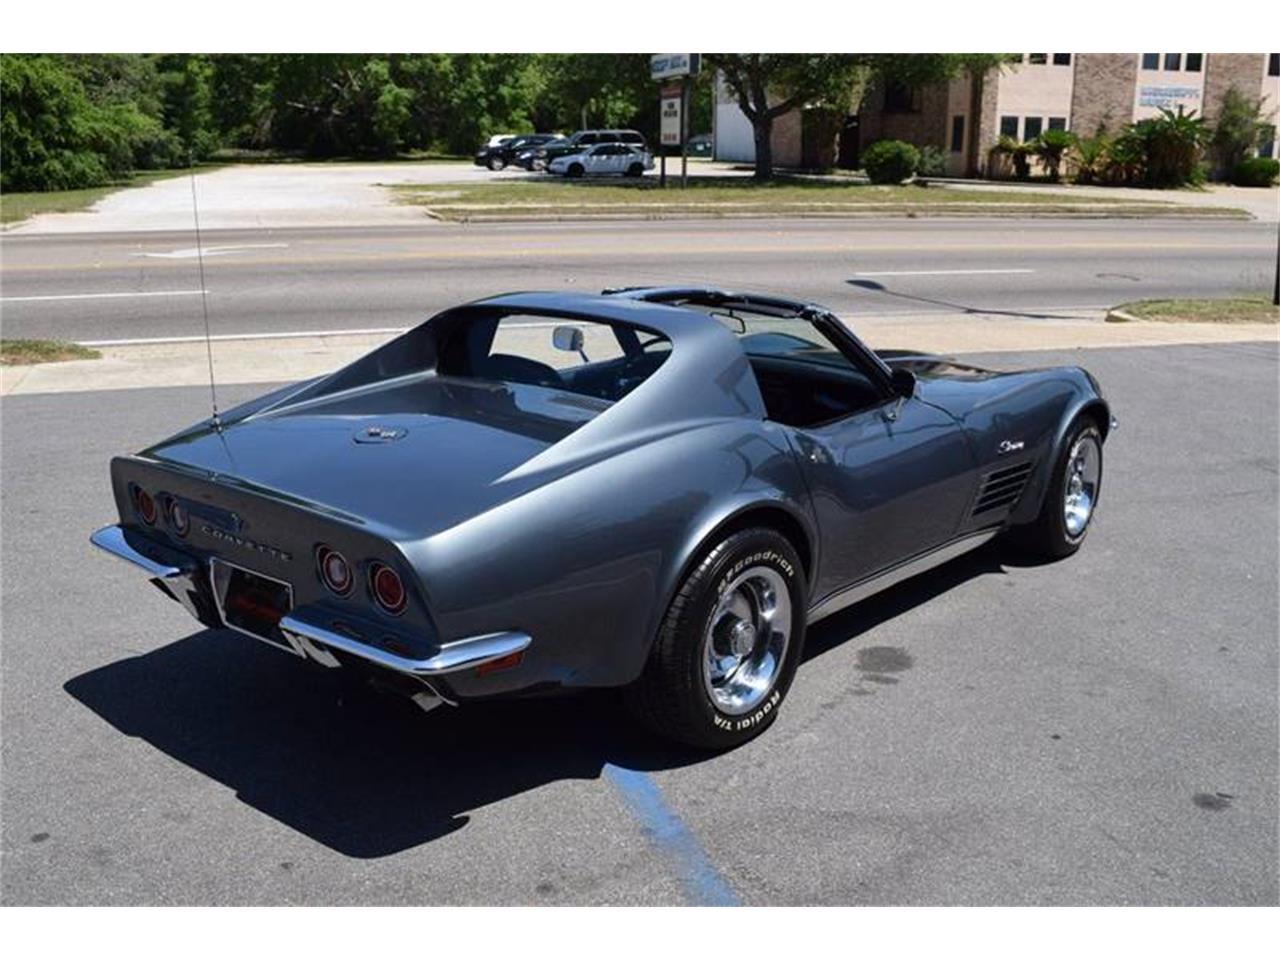 Large Picture of Classic 1970 Chevrolet Corvette located in Biloxi Mississippi - $39,500.00 - NEQX